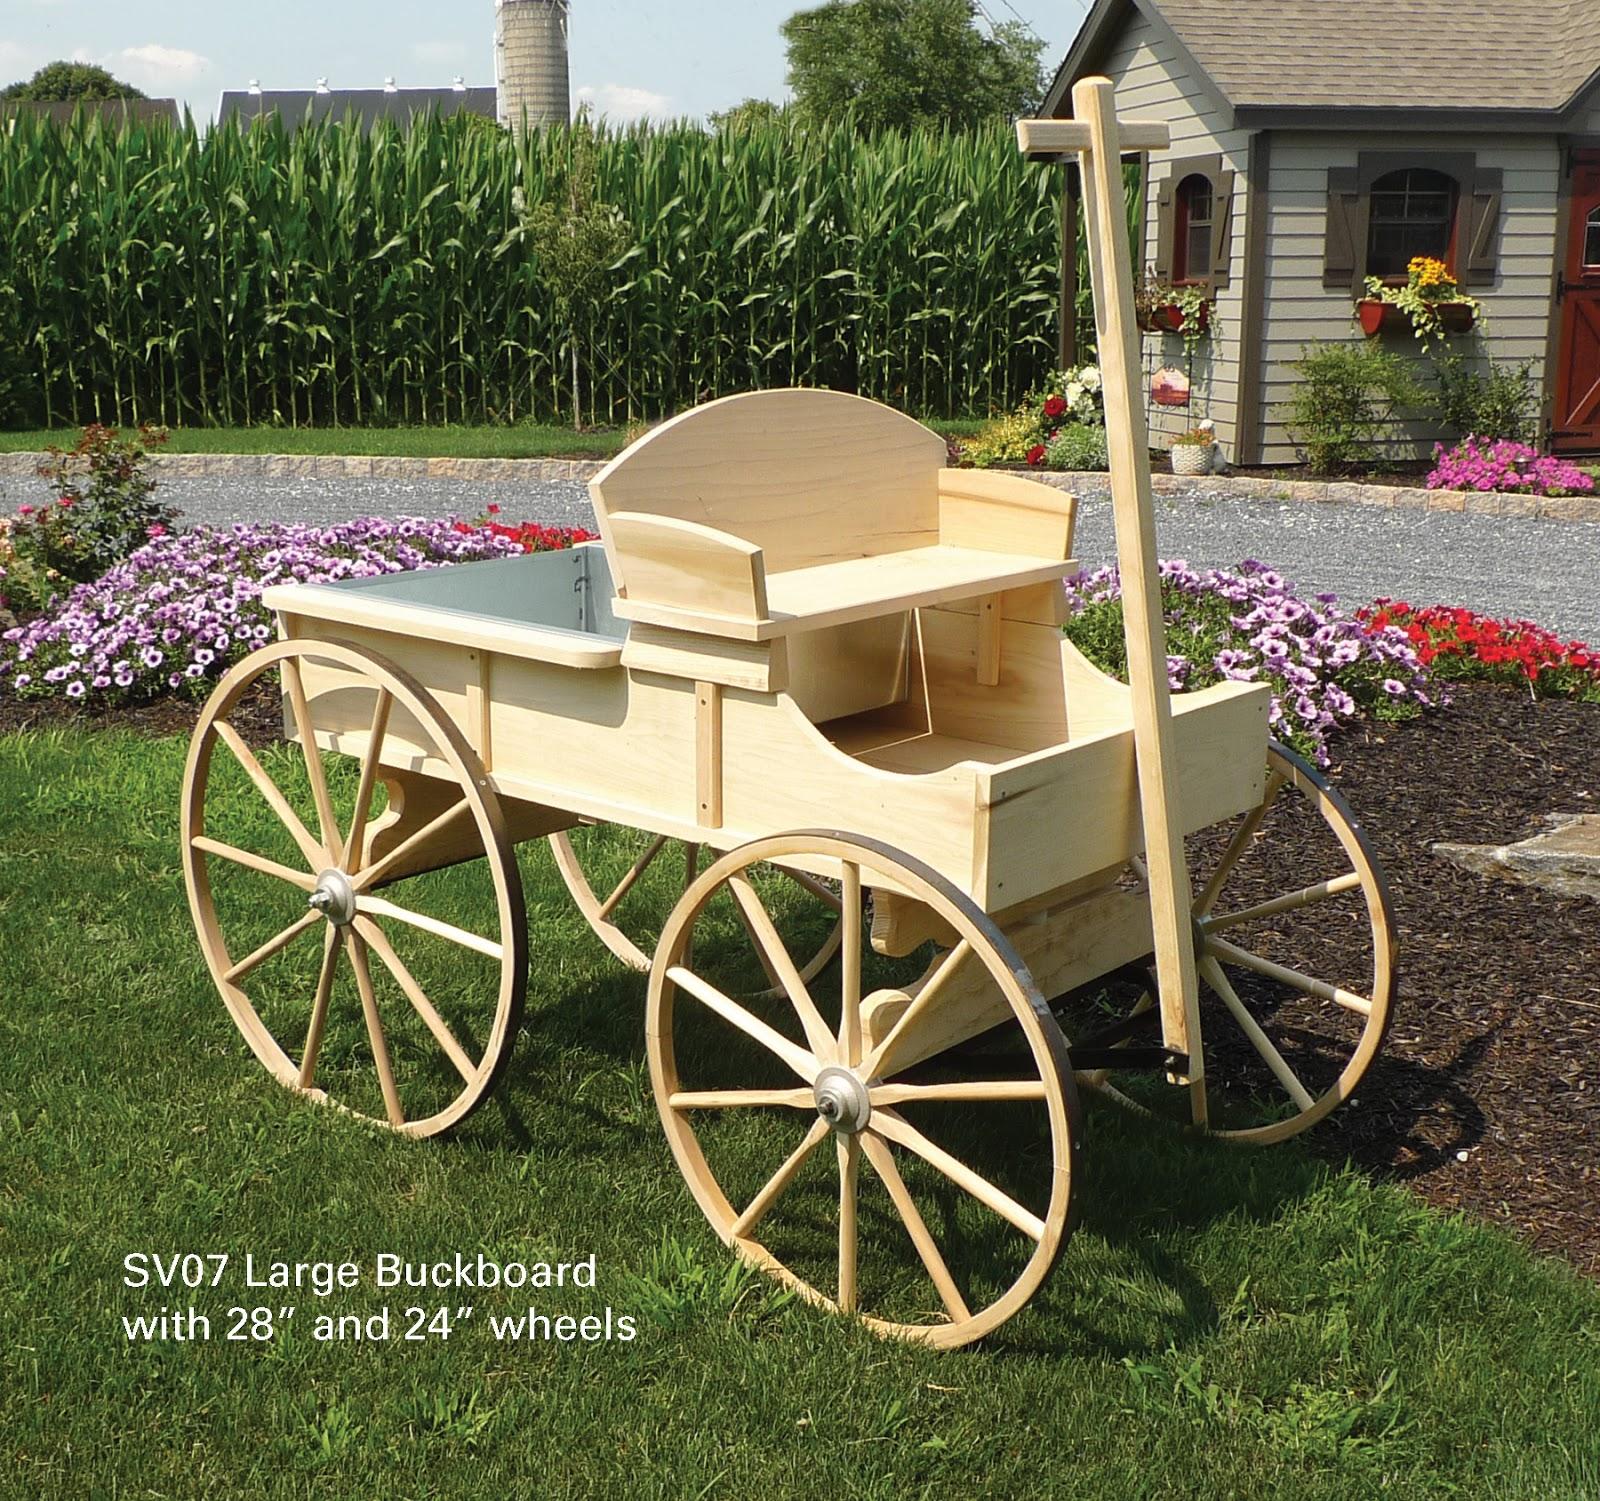 Amish Wagon Decorative Garden Decor